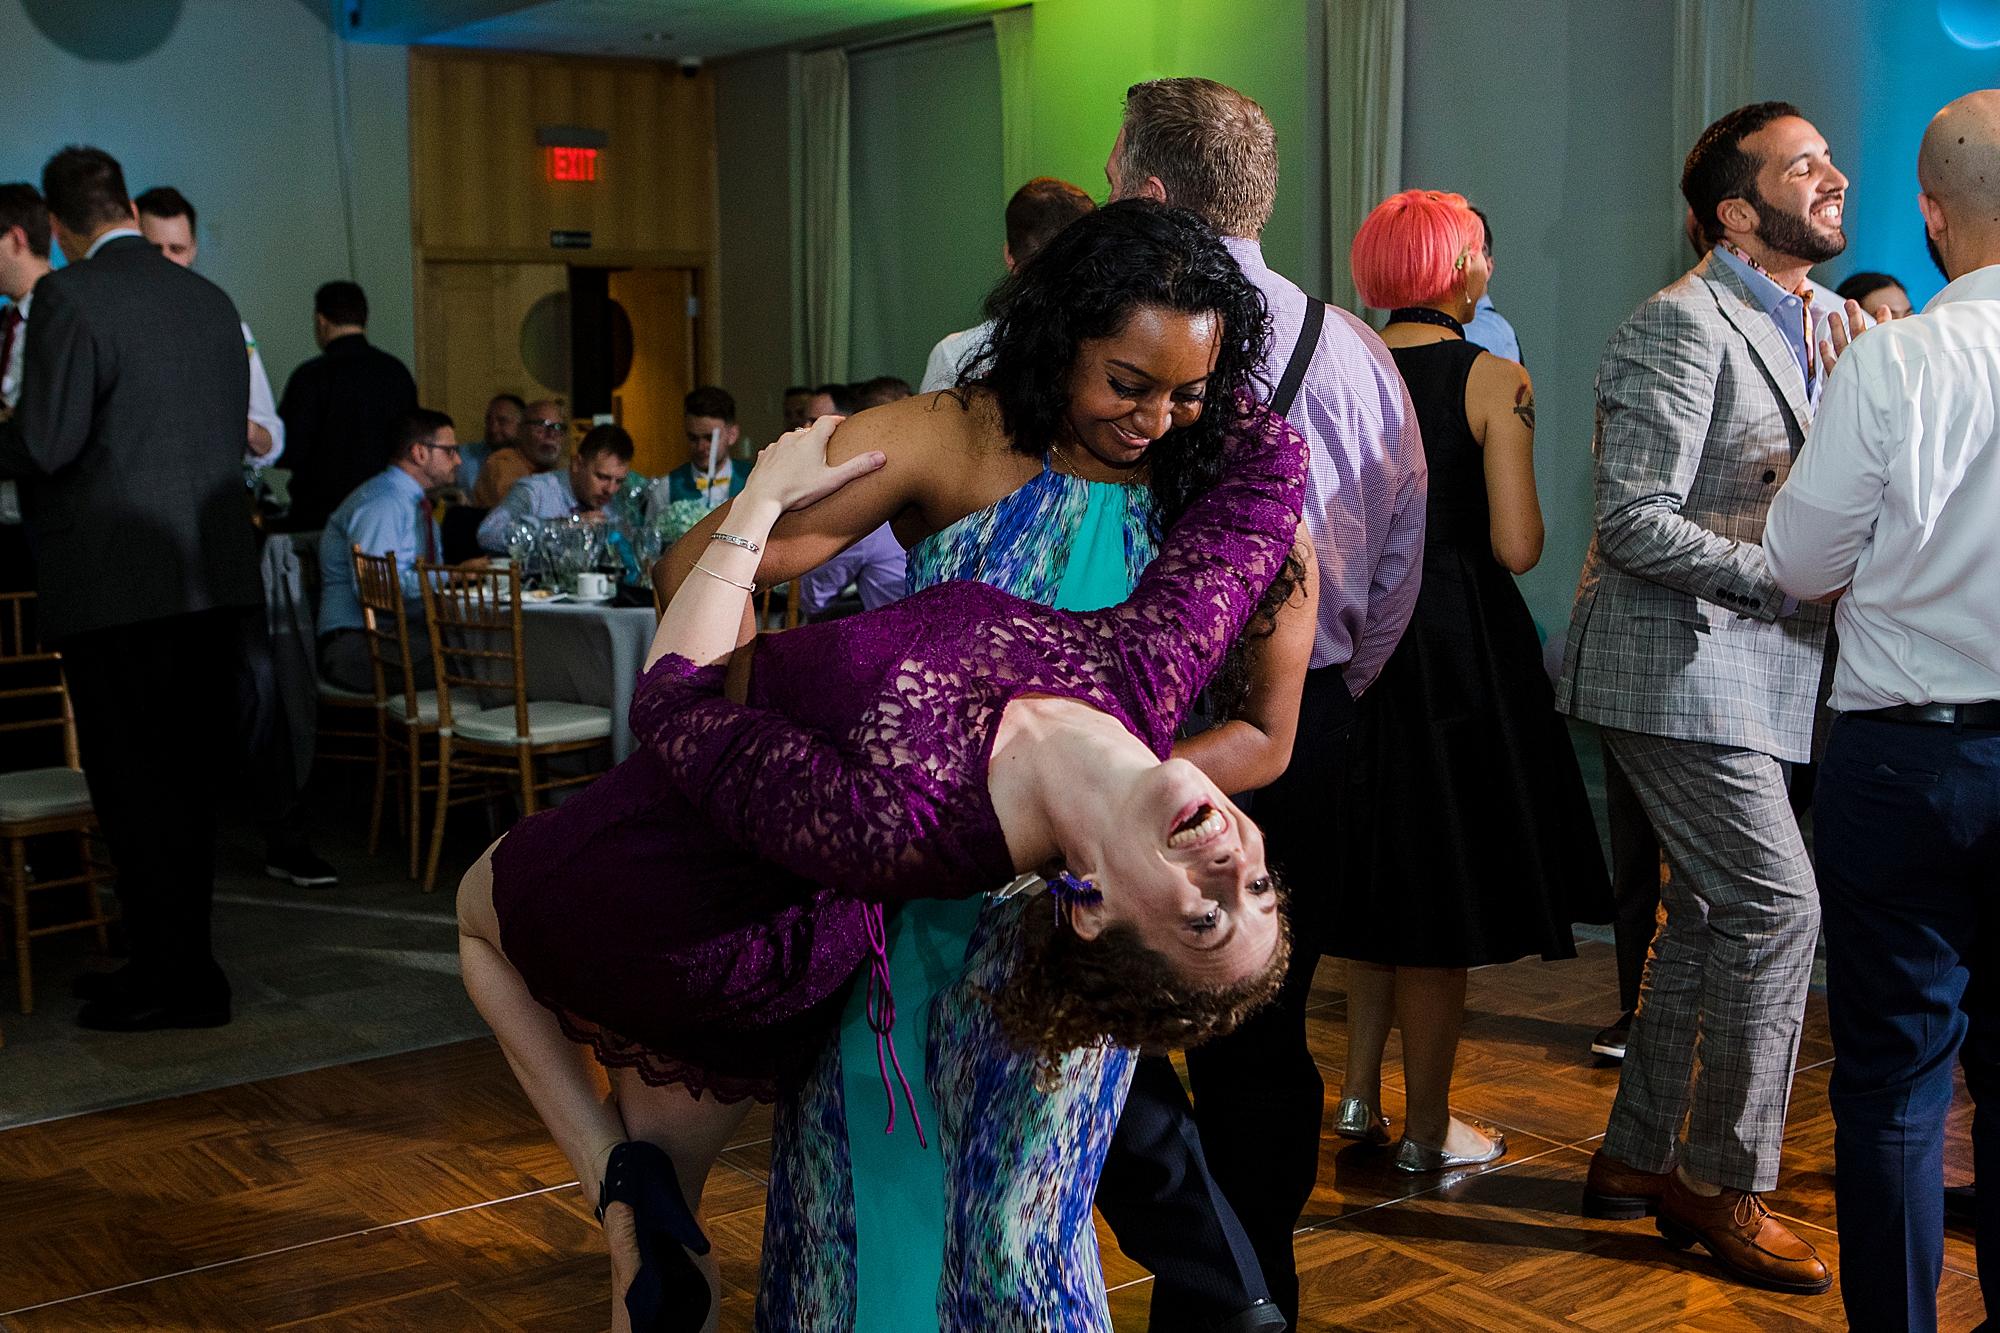 Dan_and_Byron_Love_by_Joe_Mac_Philadelphia_Wedding_LGBTQ_Photography_Gay_Independence_visitor_Center_148.JPG